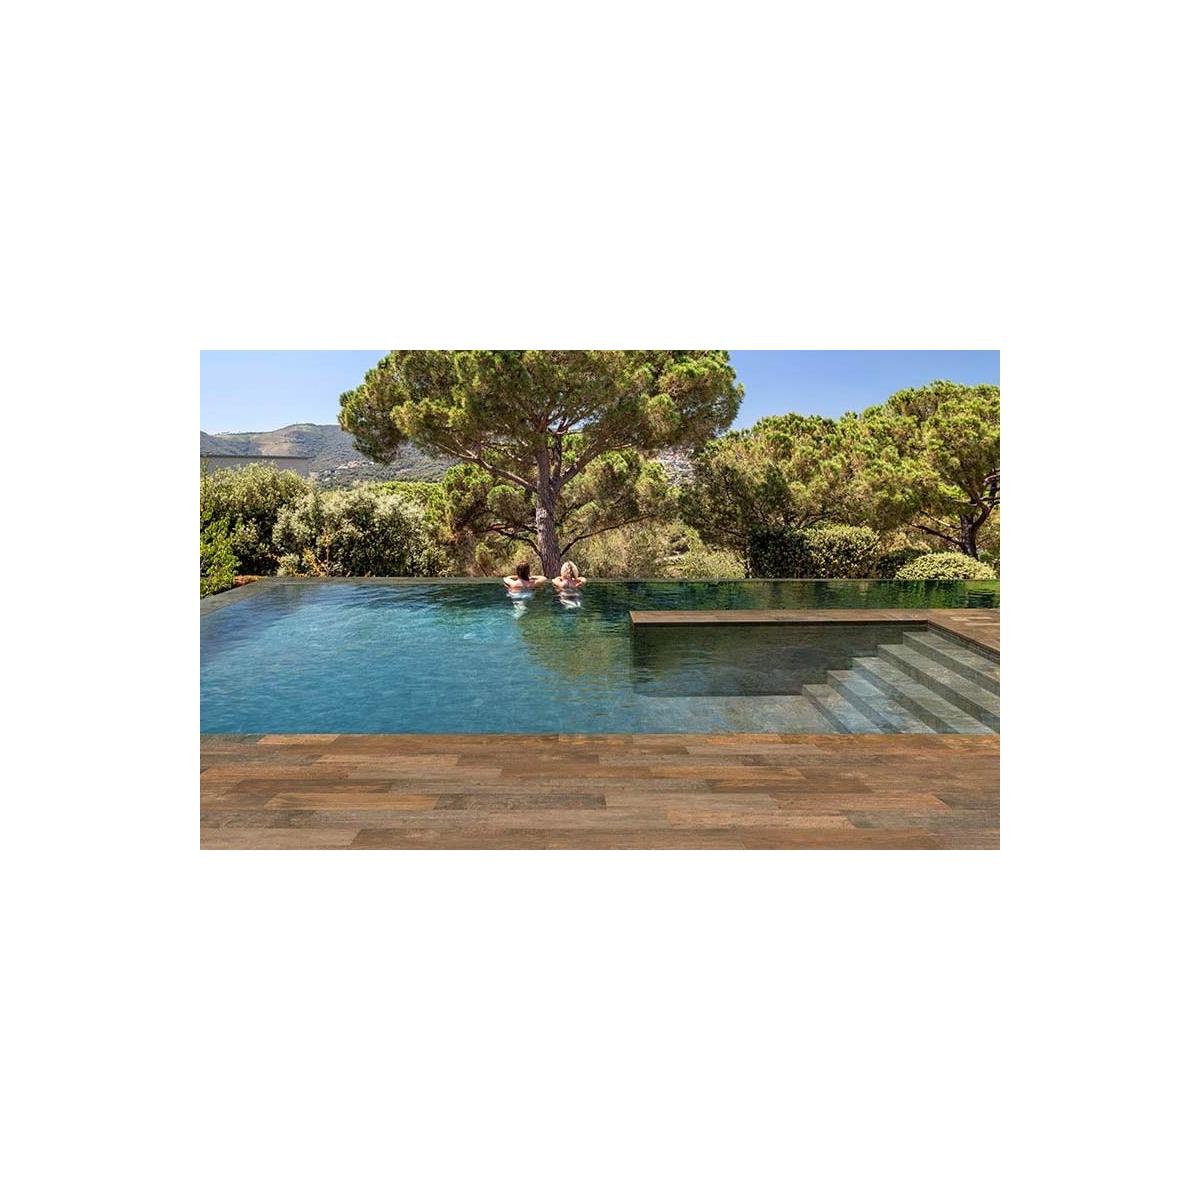 Borde de piscina curvo serie Stela Dark S62 62,6x31,7x3,8 Rosagres